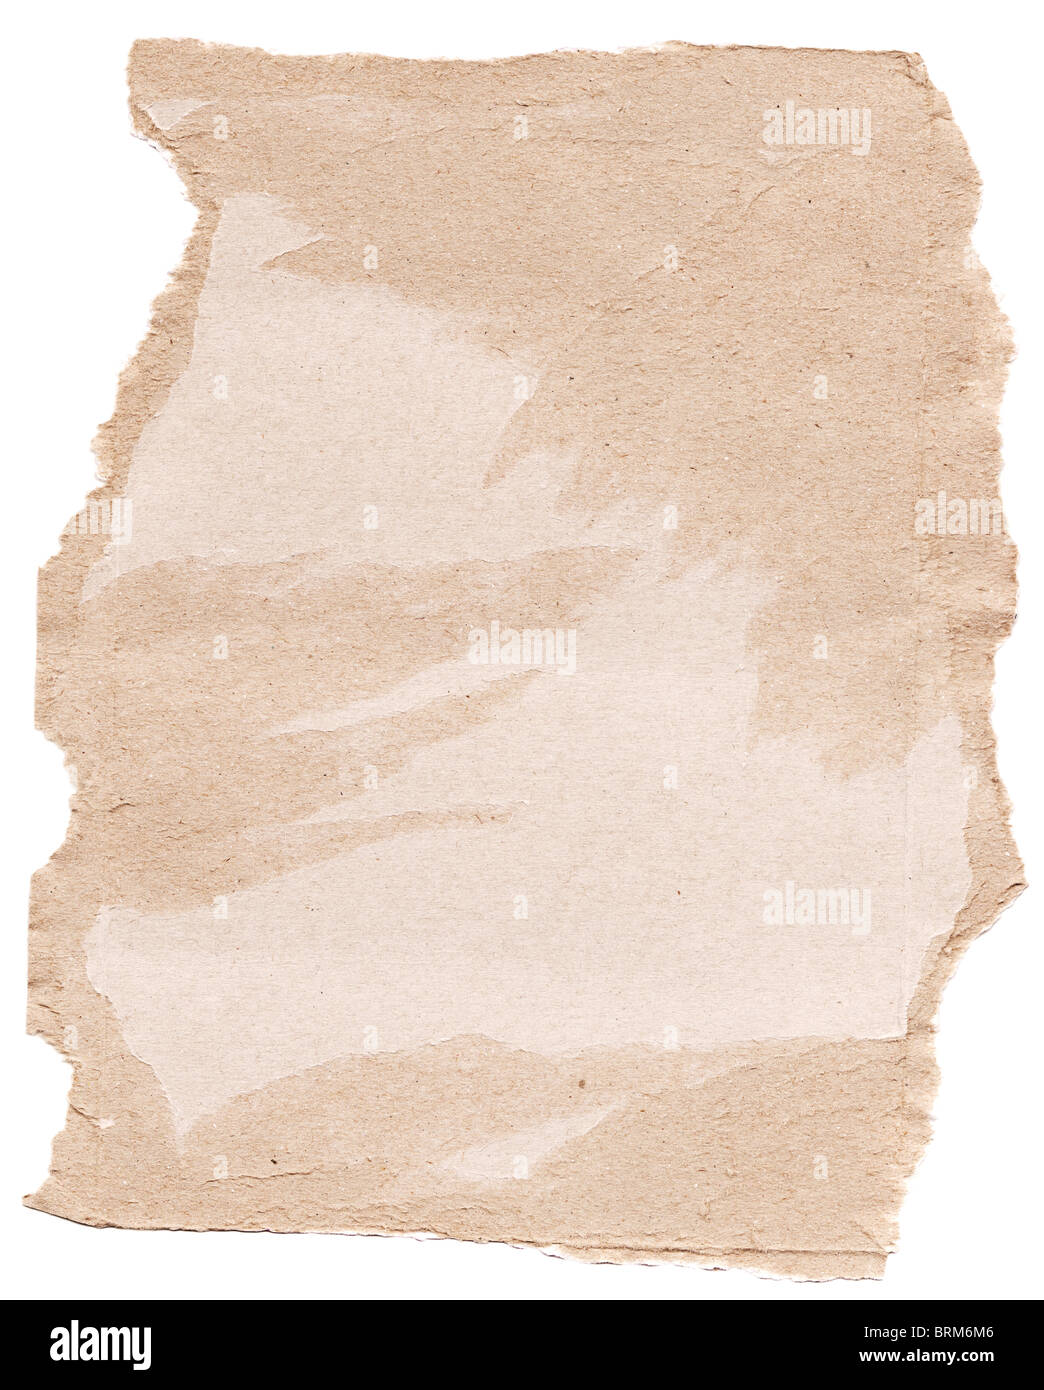 High resolution scrap of torn brown cardboard - Stock Image